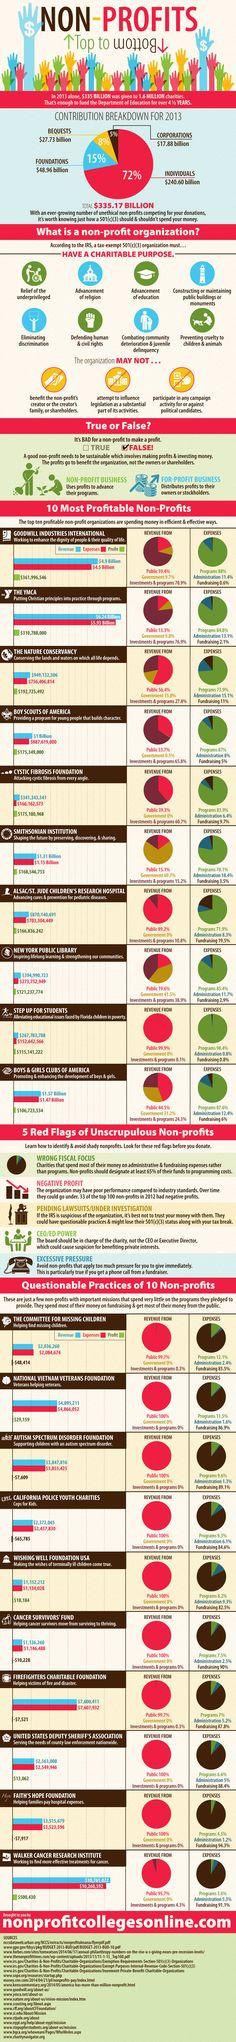 10 Most Profitable Non-Profits